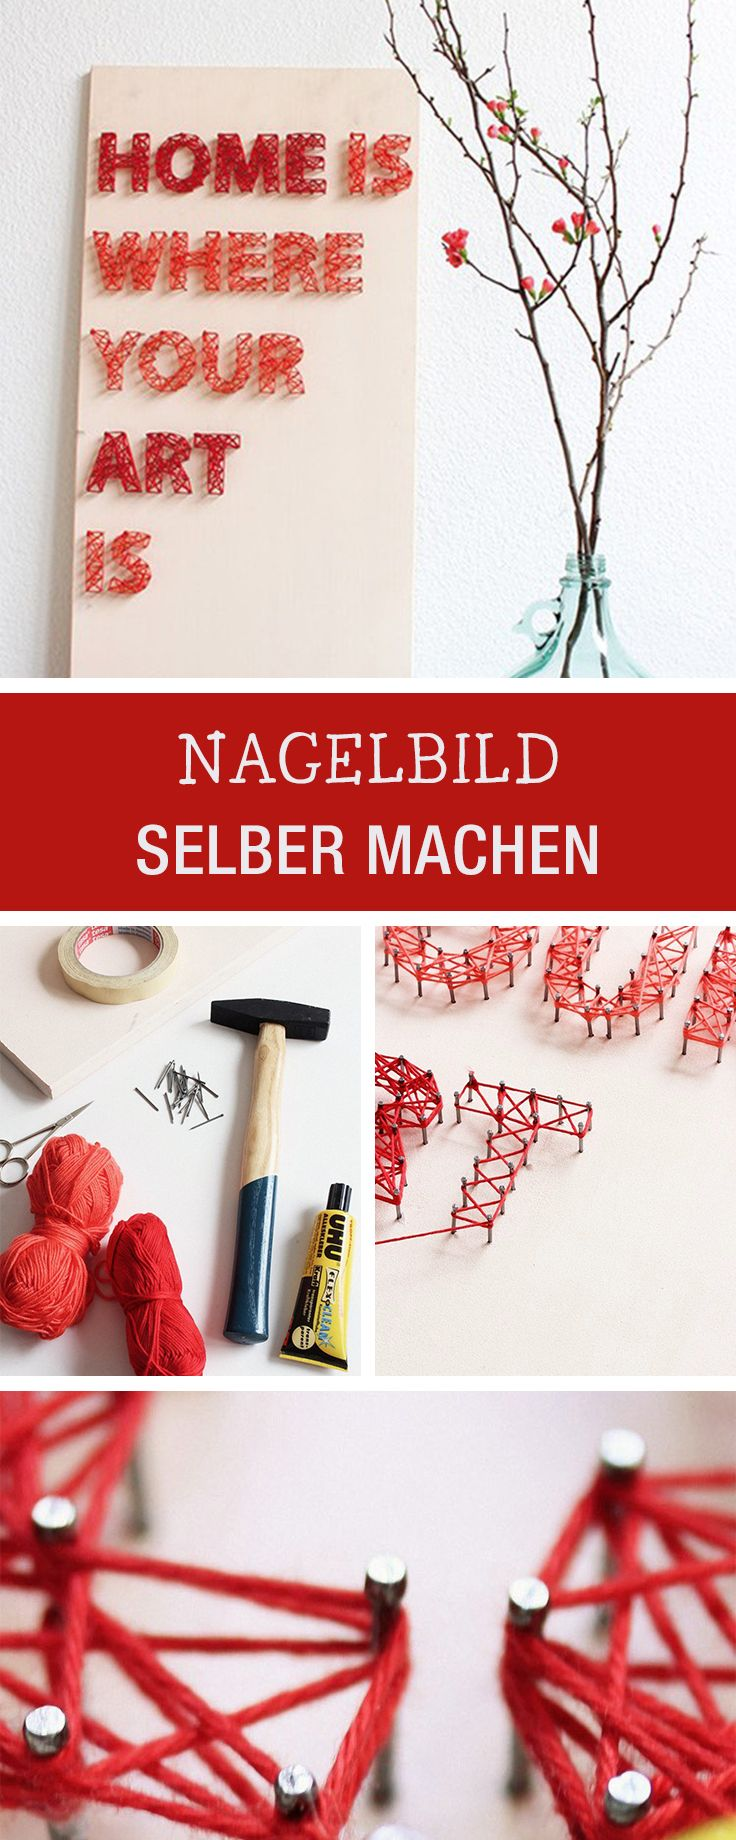 DIY für kreative Wohndeko: Nagelbild selbermachen / tutorial for a handmade nail picture, crafting with yarn via DaWanda.com